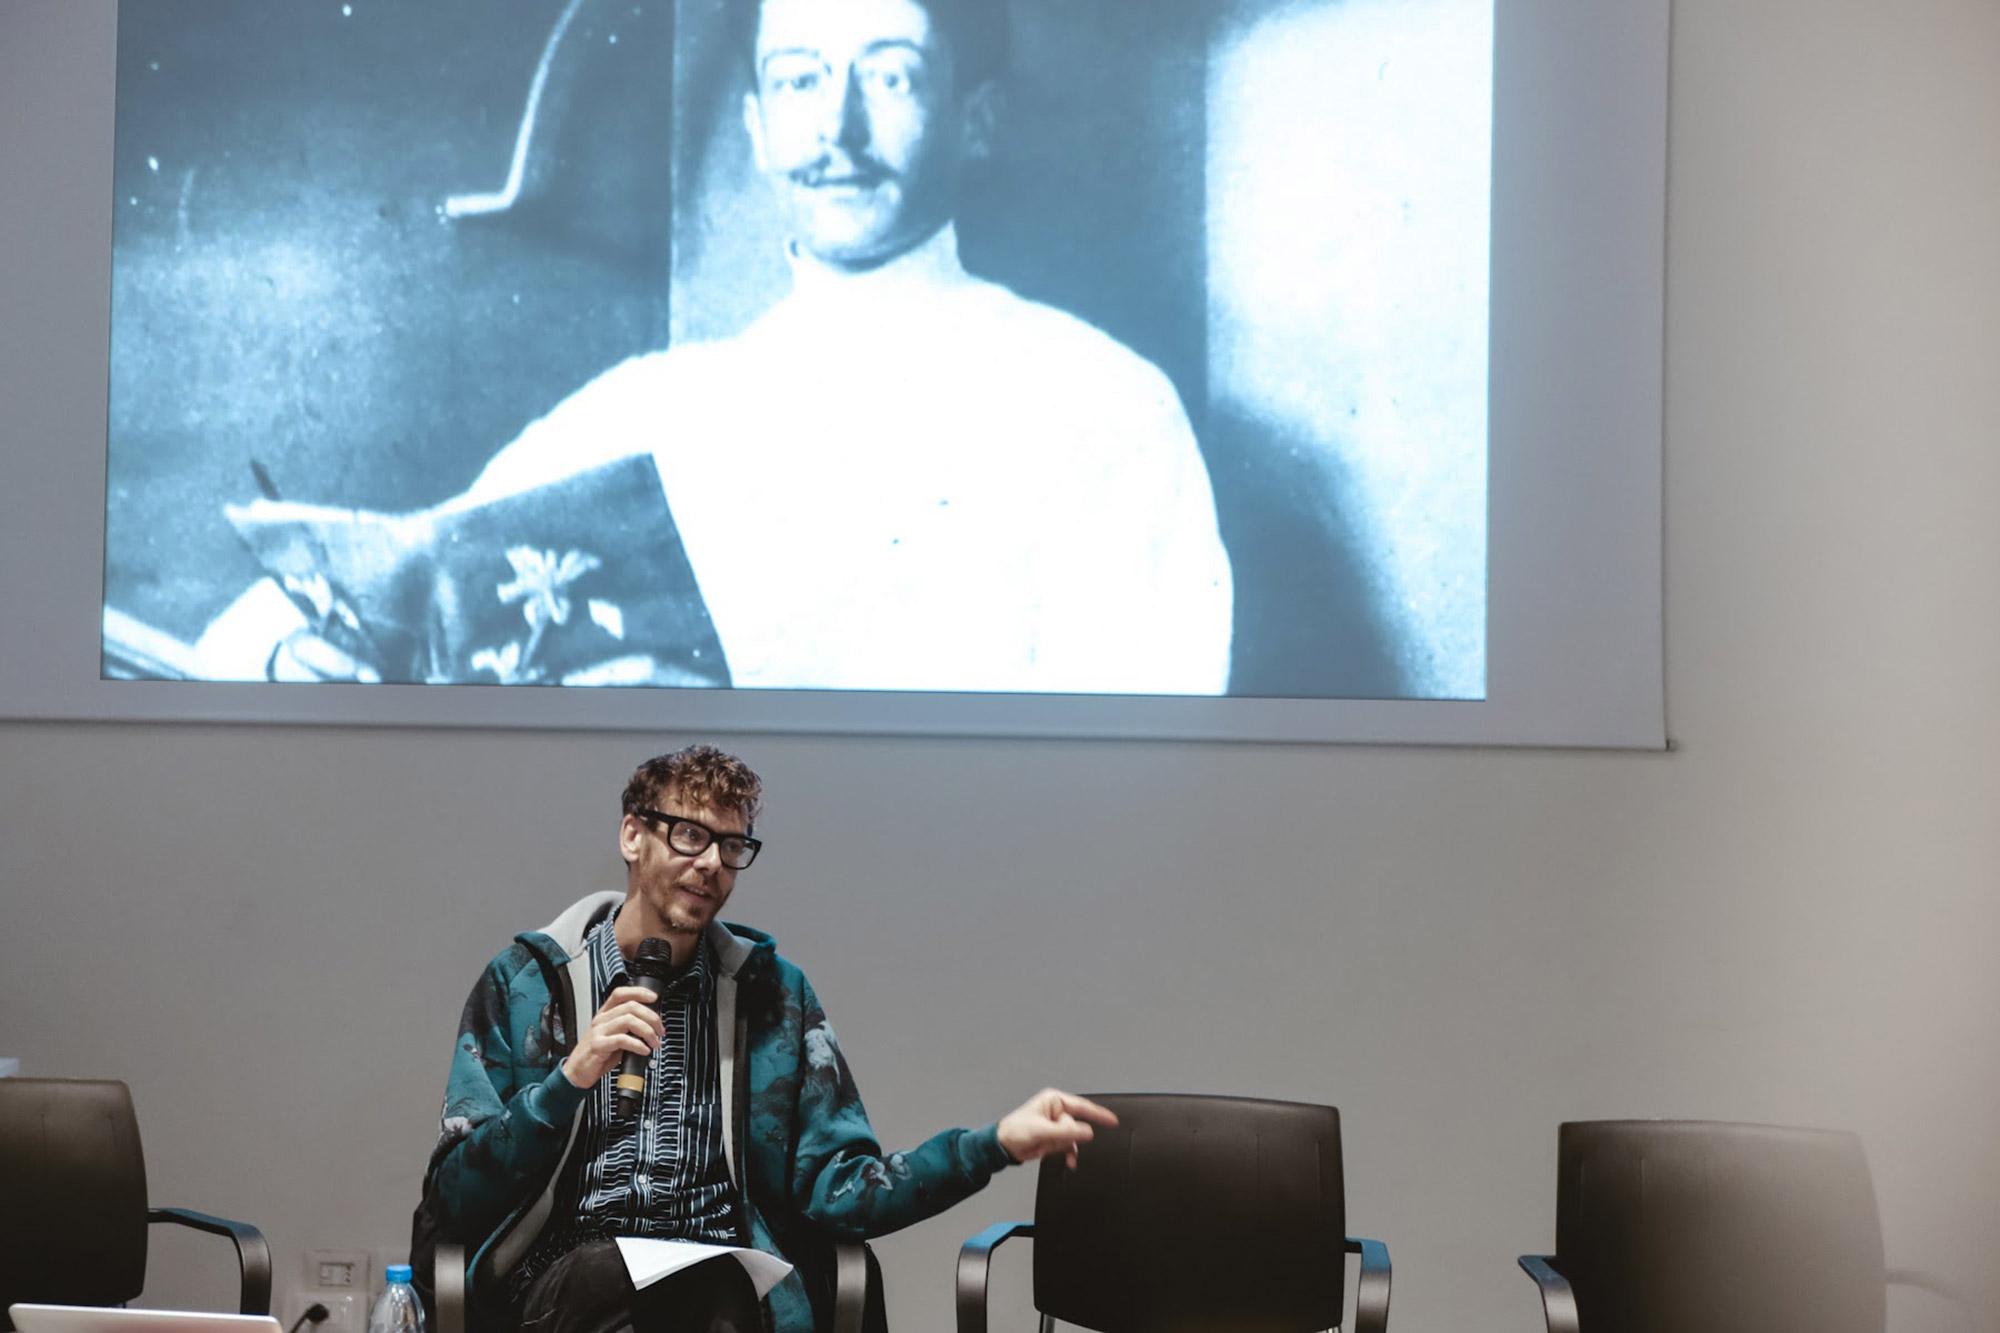 Esotismo autentico, Florian Meyer/Don't Dj, lecture a MASH 2016, Milano